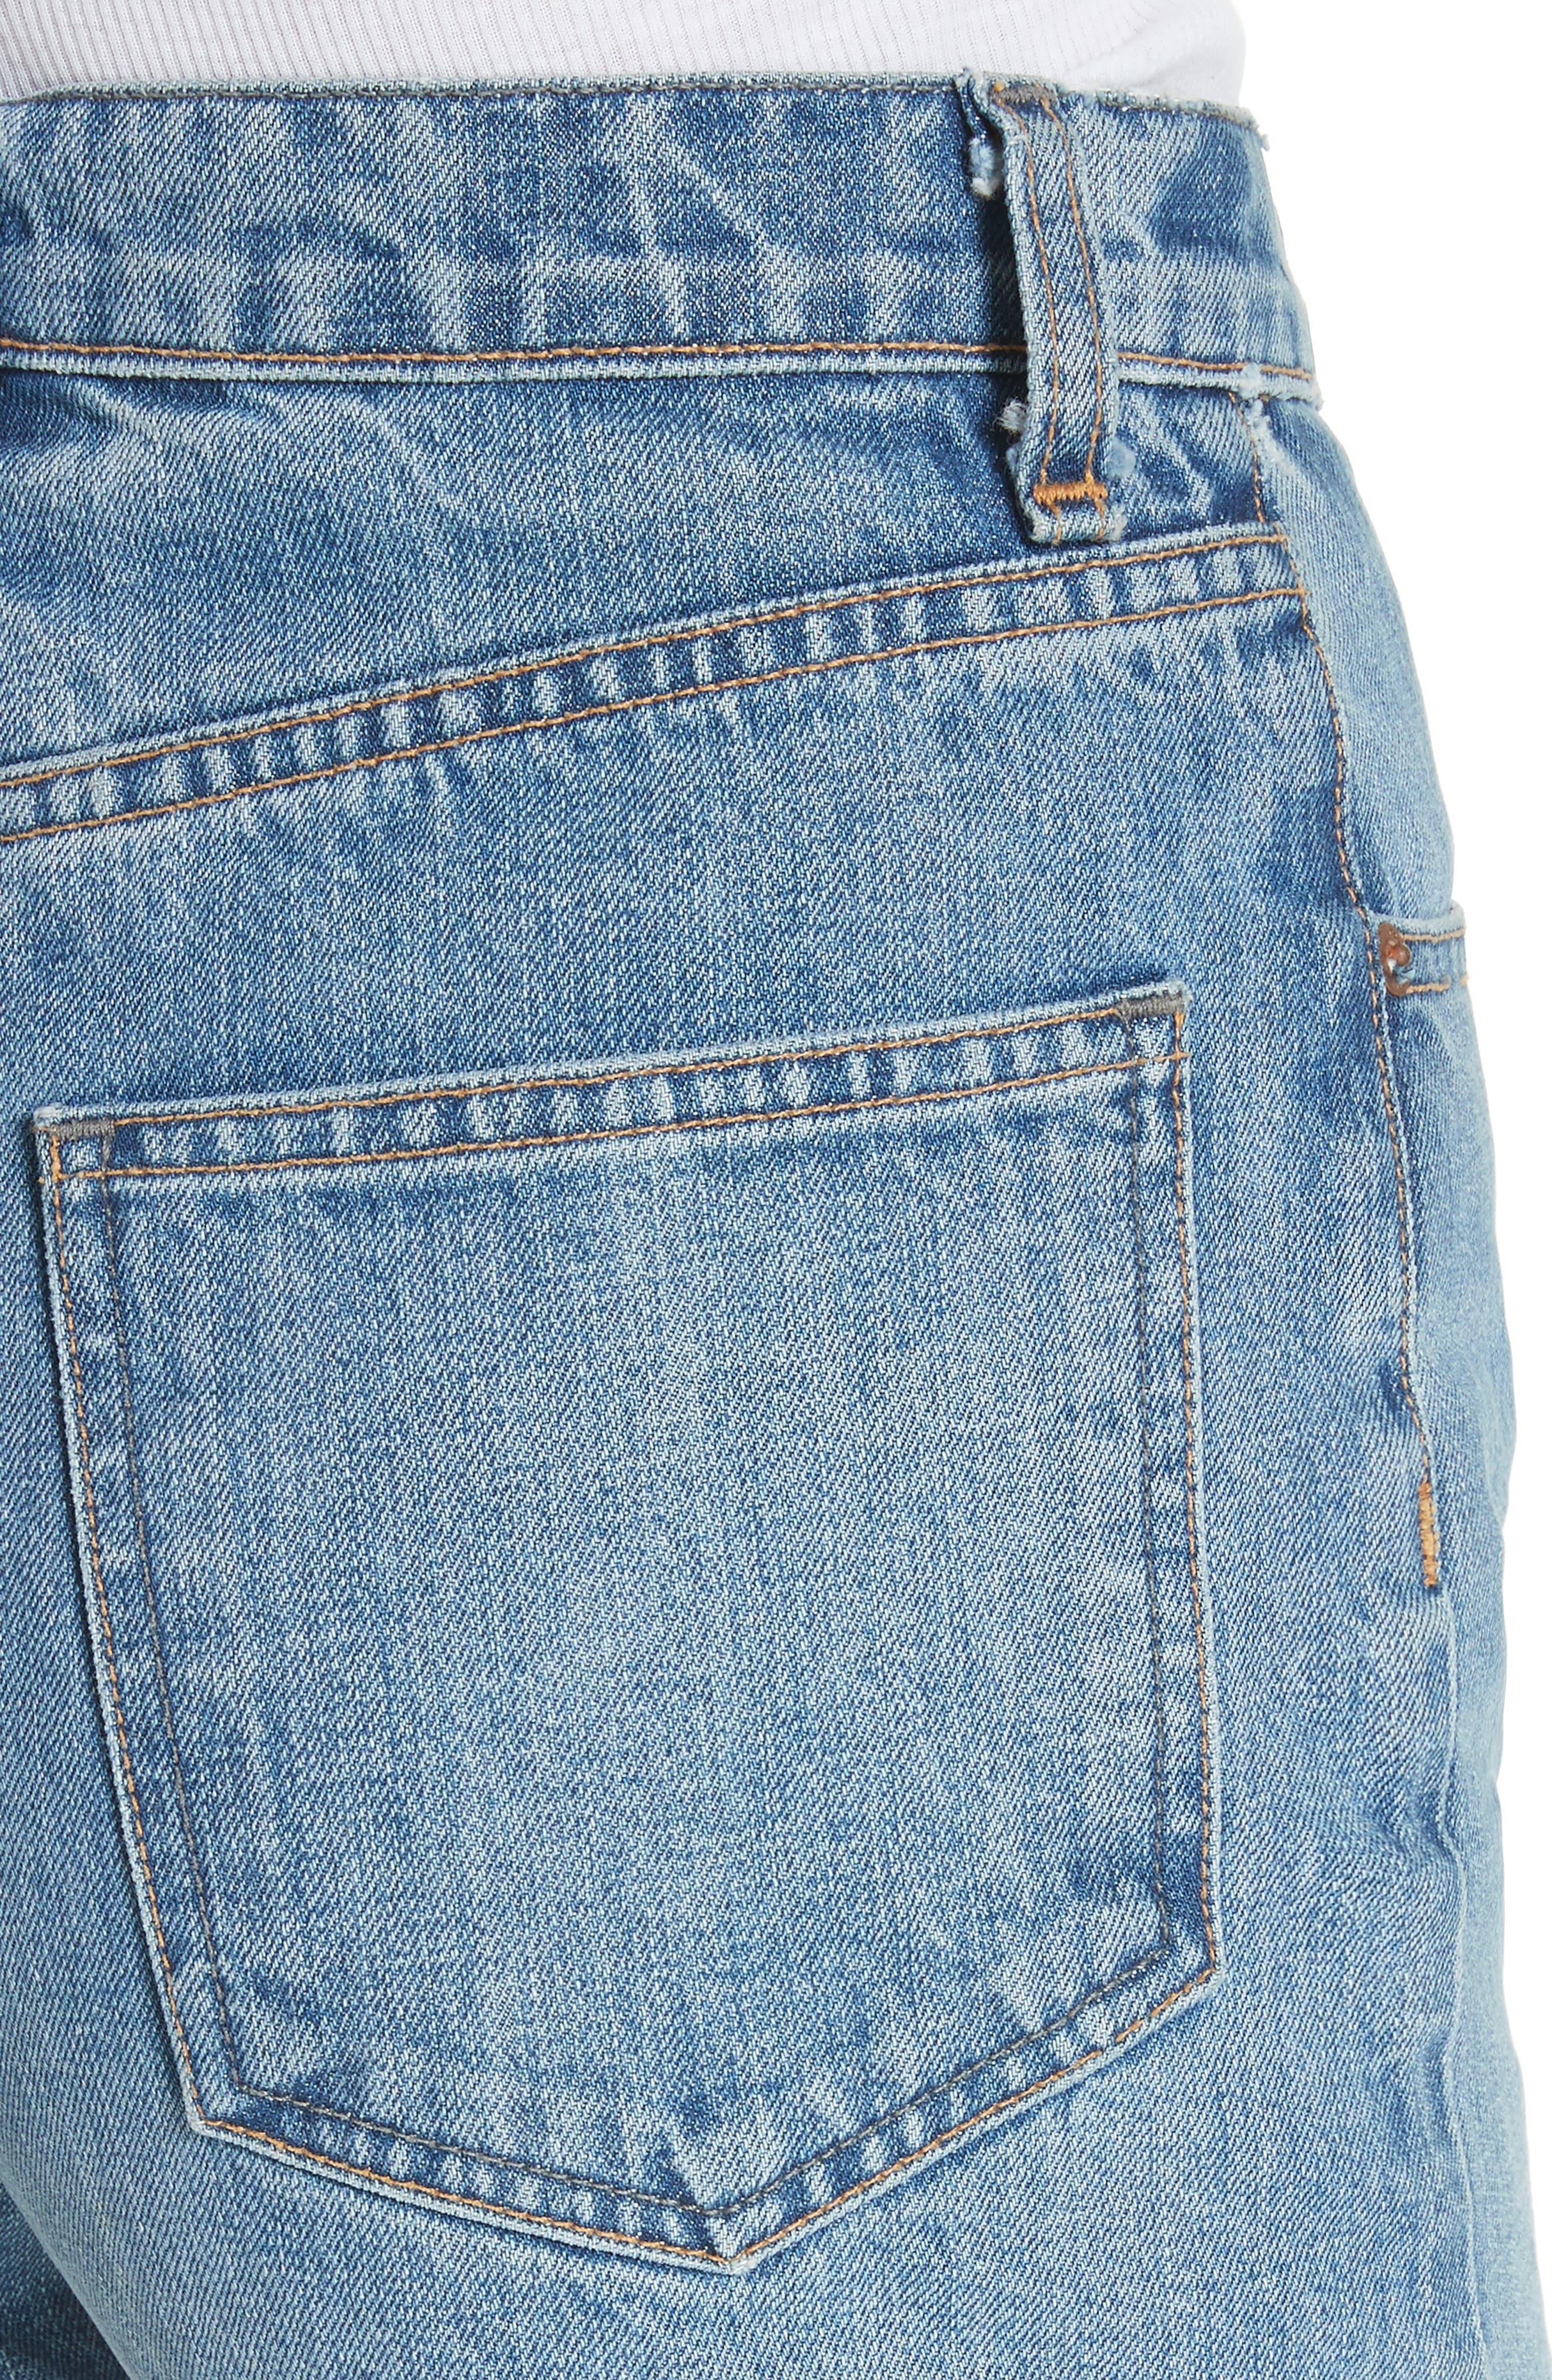 Torti High Waist Denim Shorts,                             Alternate thumbnail 4, color,                             Vintage